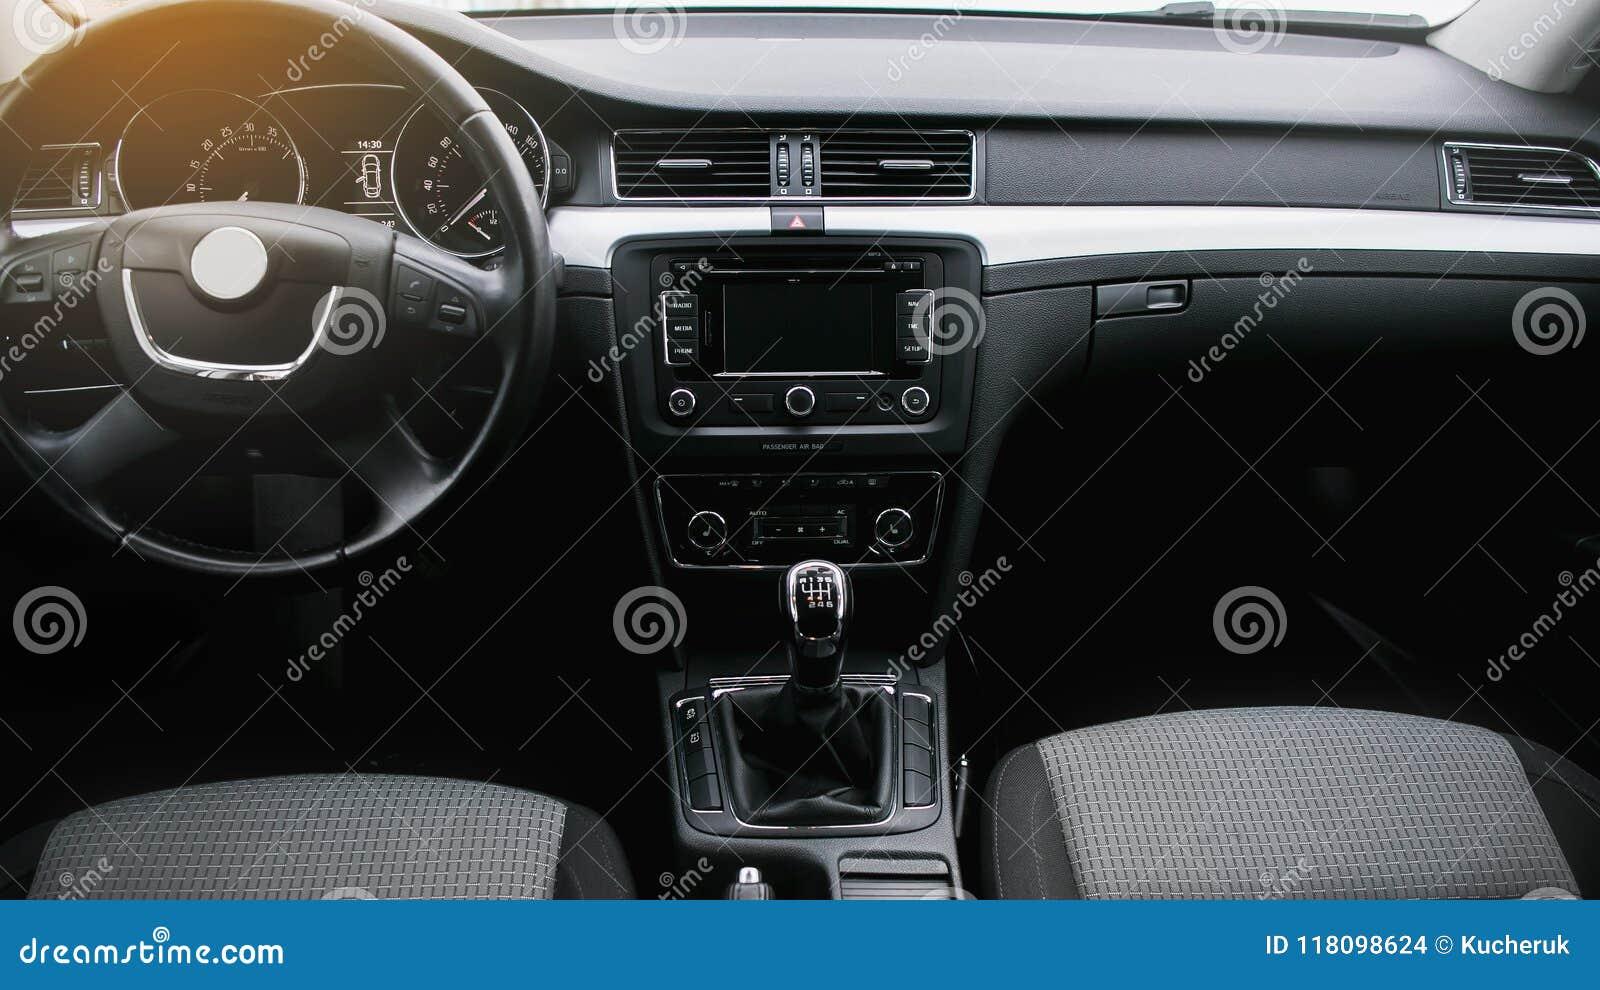 Modern car interior. Steering wheel, dashboard, speedometer, display.